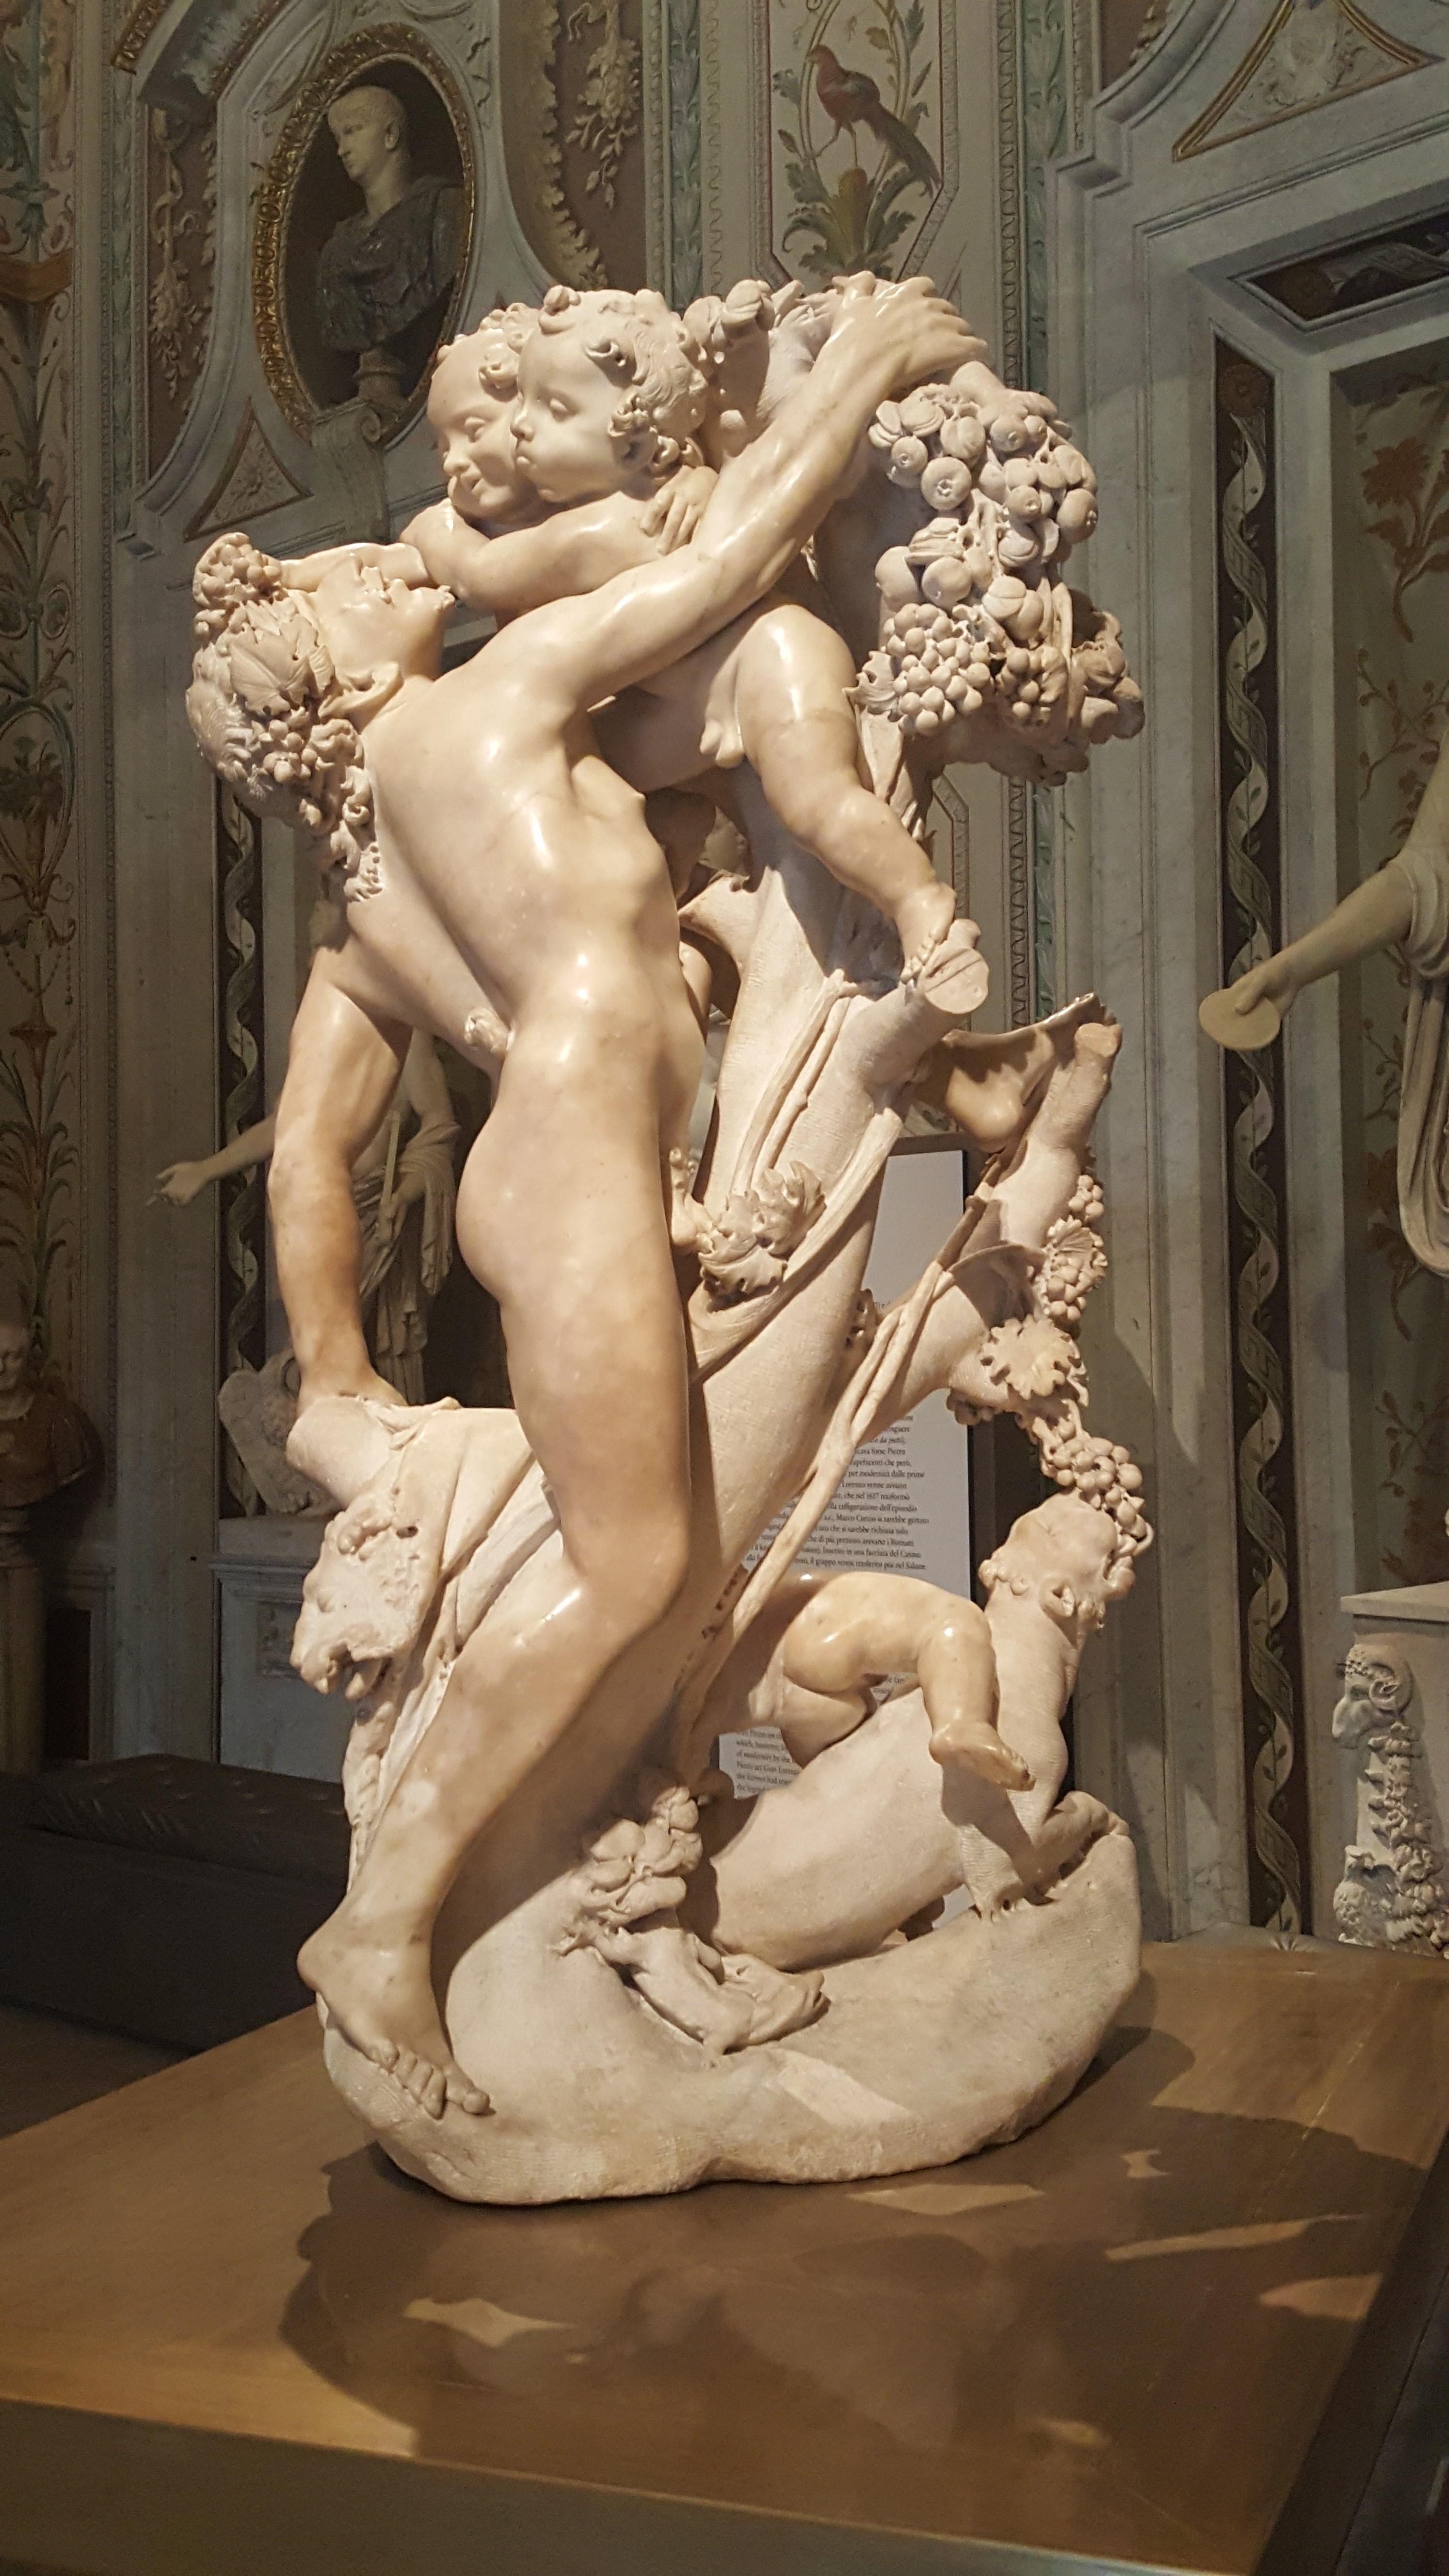 Pietro e Gian Lorenzo Bernini, 'Fauno molestato dai putti' (1615 circa). New York, Metropolitan Museum of Art